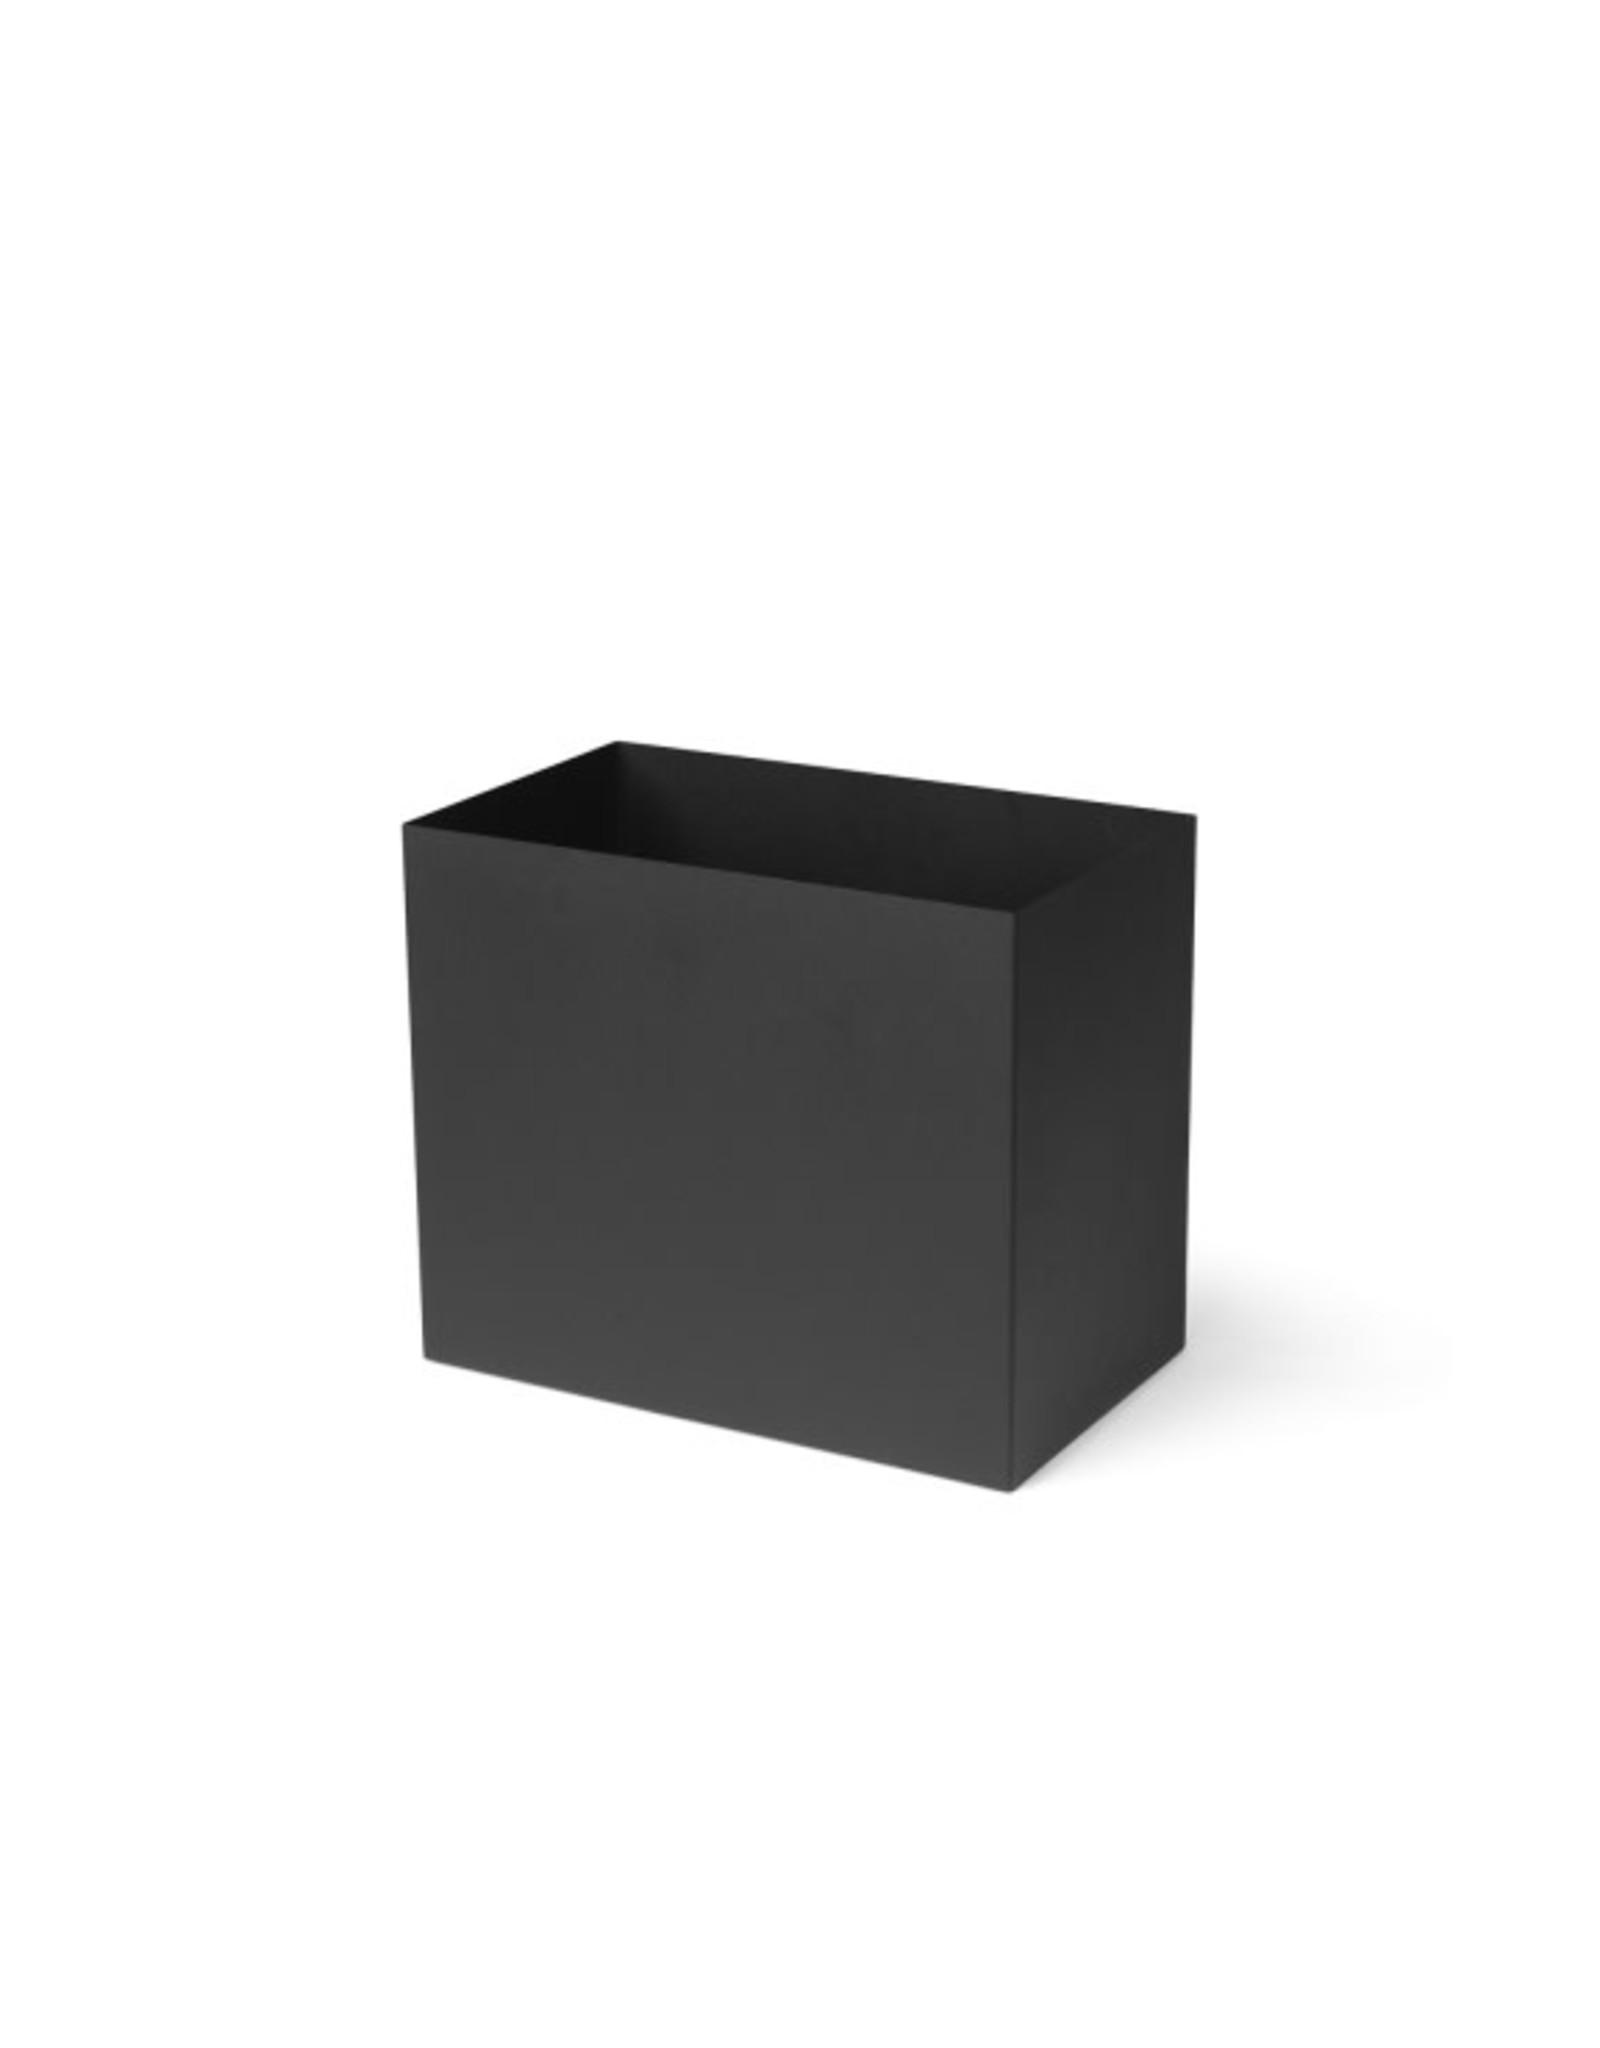 FERM LIVING FERM LIVING Plant Box Pot Large Black